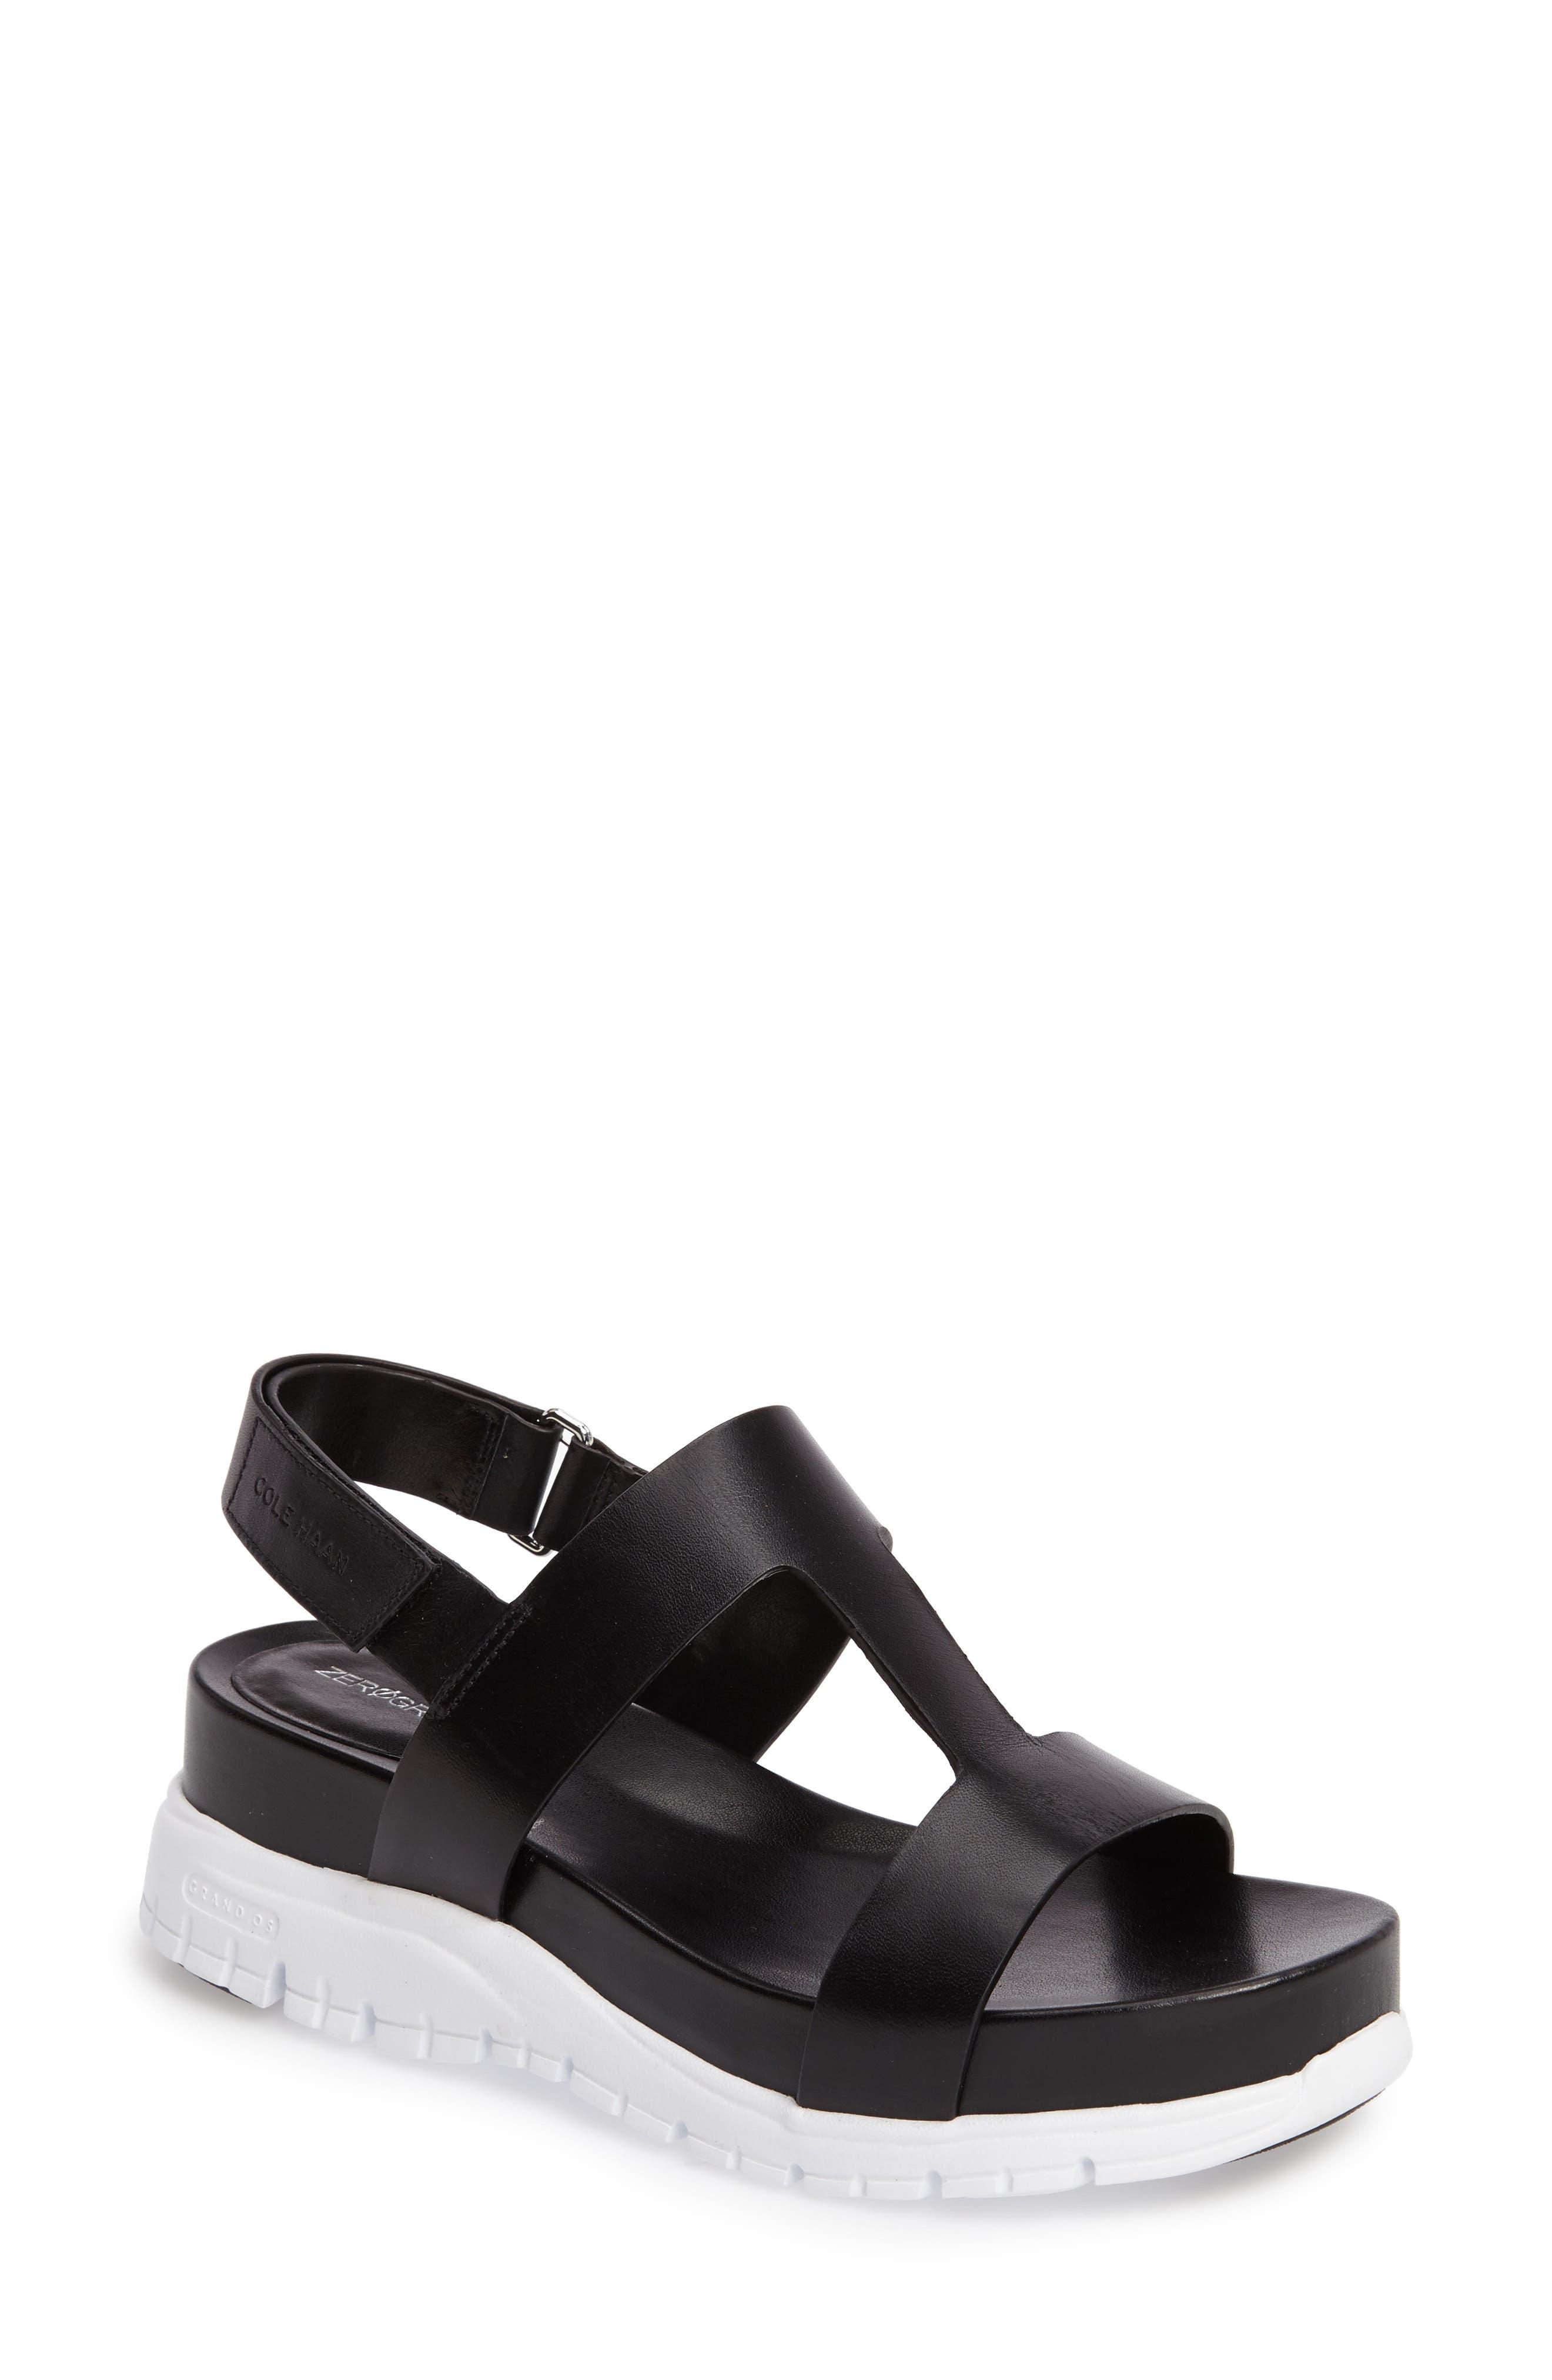 COLE HAAN ZeroGrand T-Strap Sandal